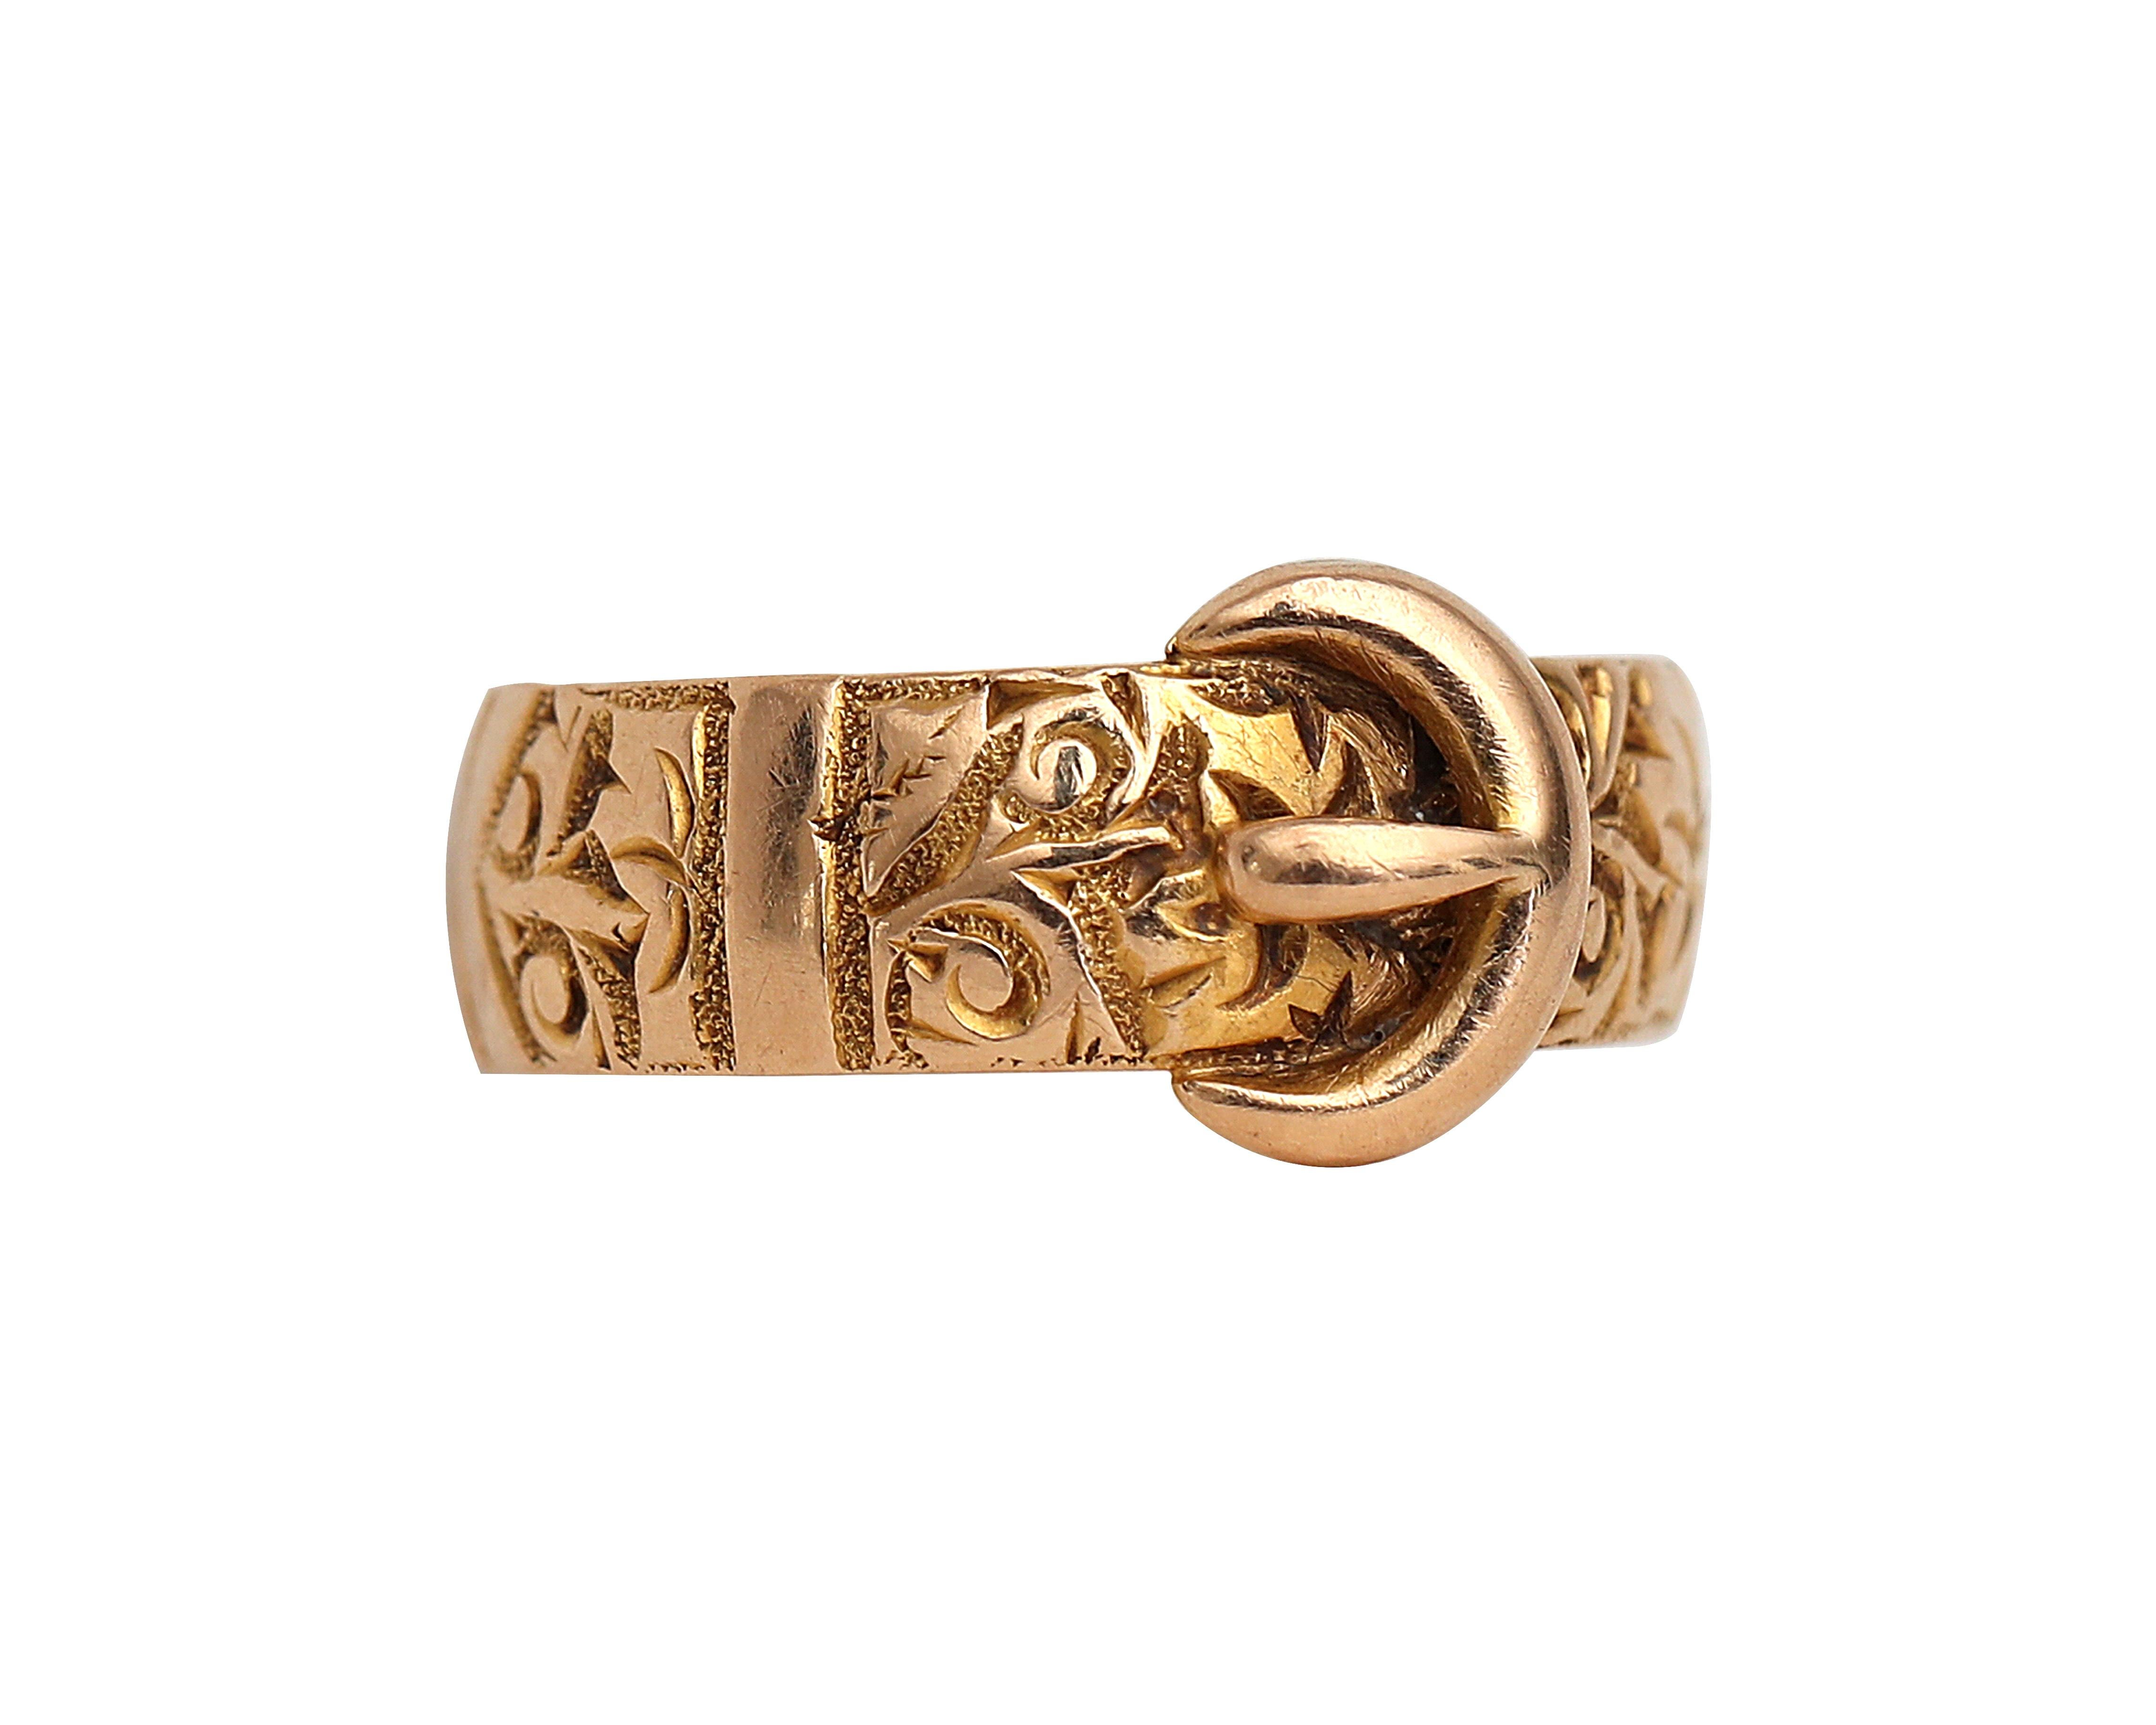 Victorian 18 Karat Yellow Gold Hand Etched Vintage Carved Belt Buckle Ring